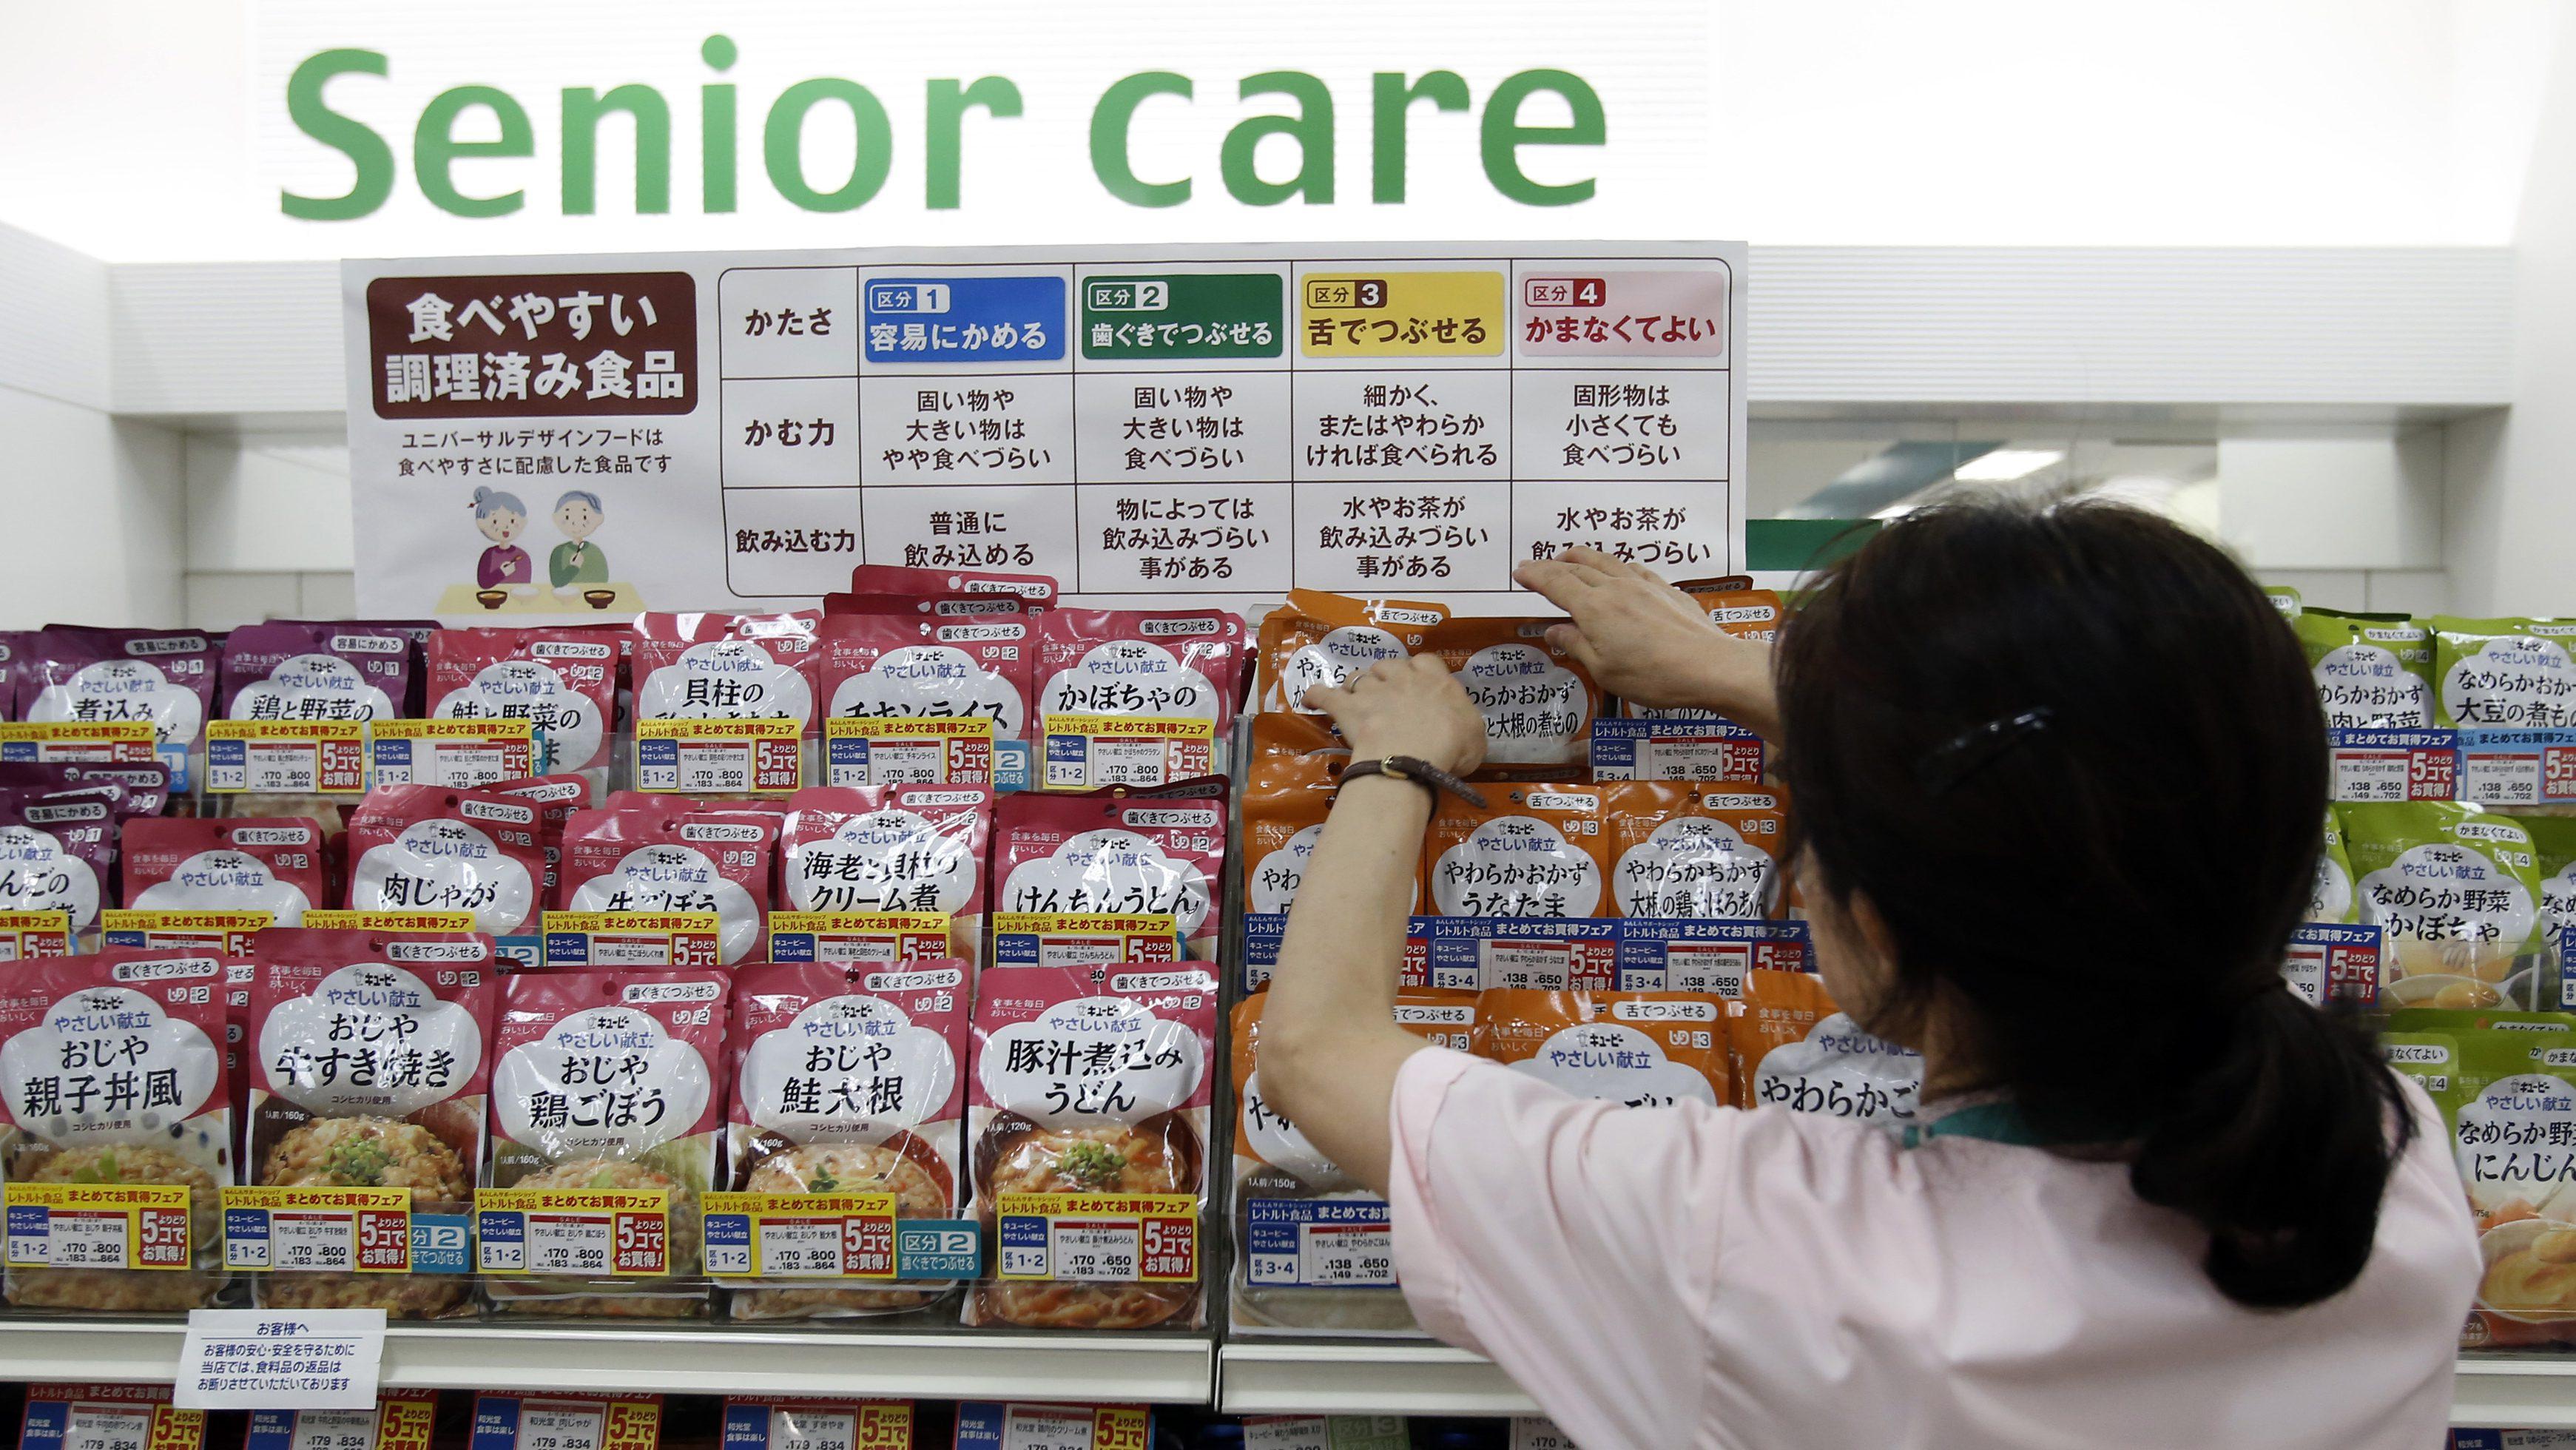 A staff arranges Kewpie Corp's nursing care food packages on a display shelf in Tokyo in 2014.